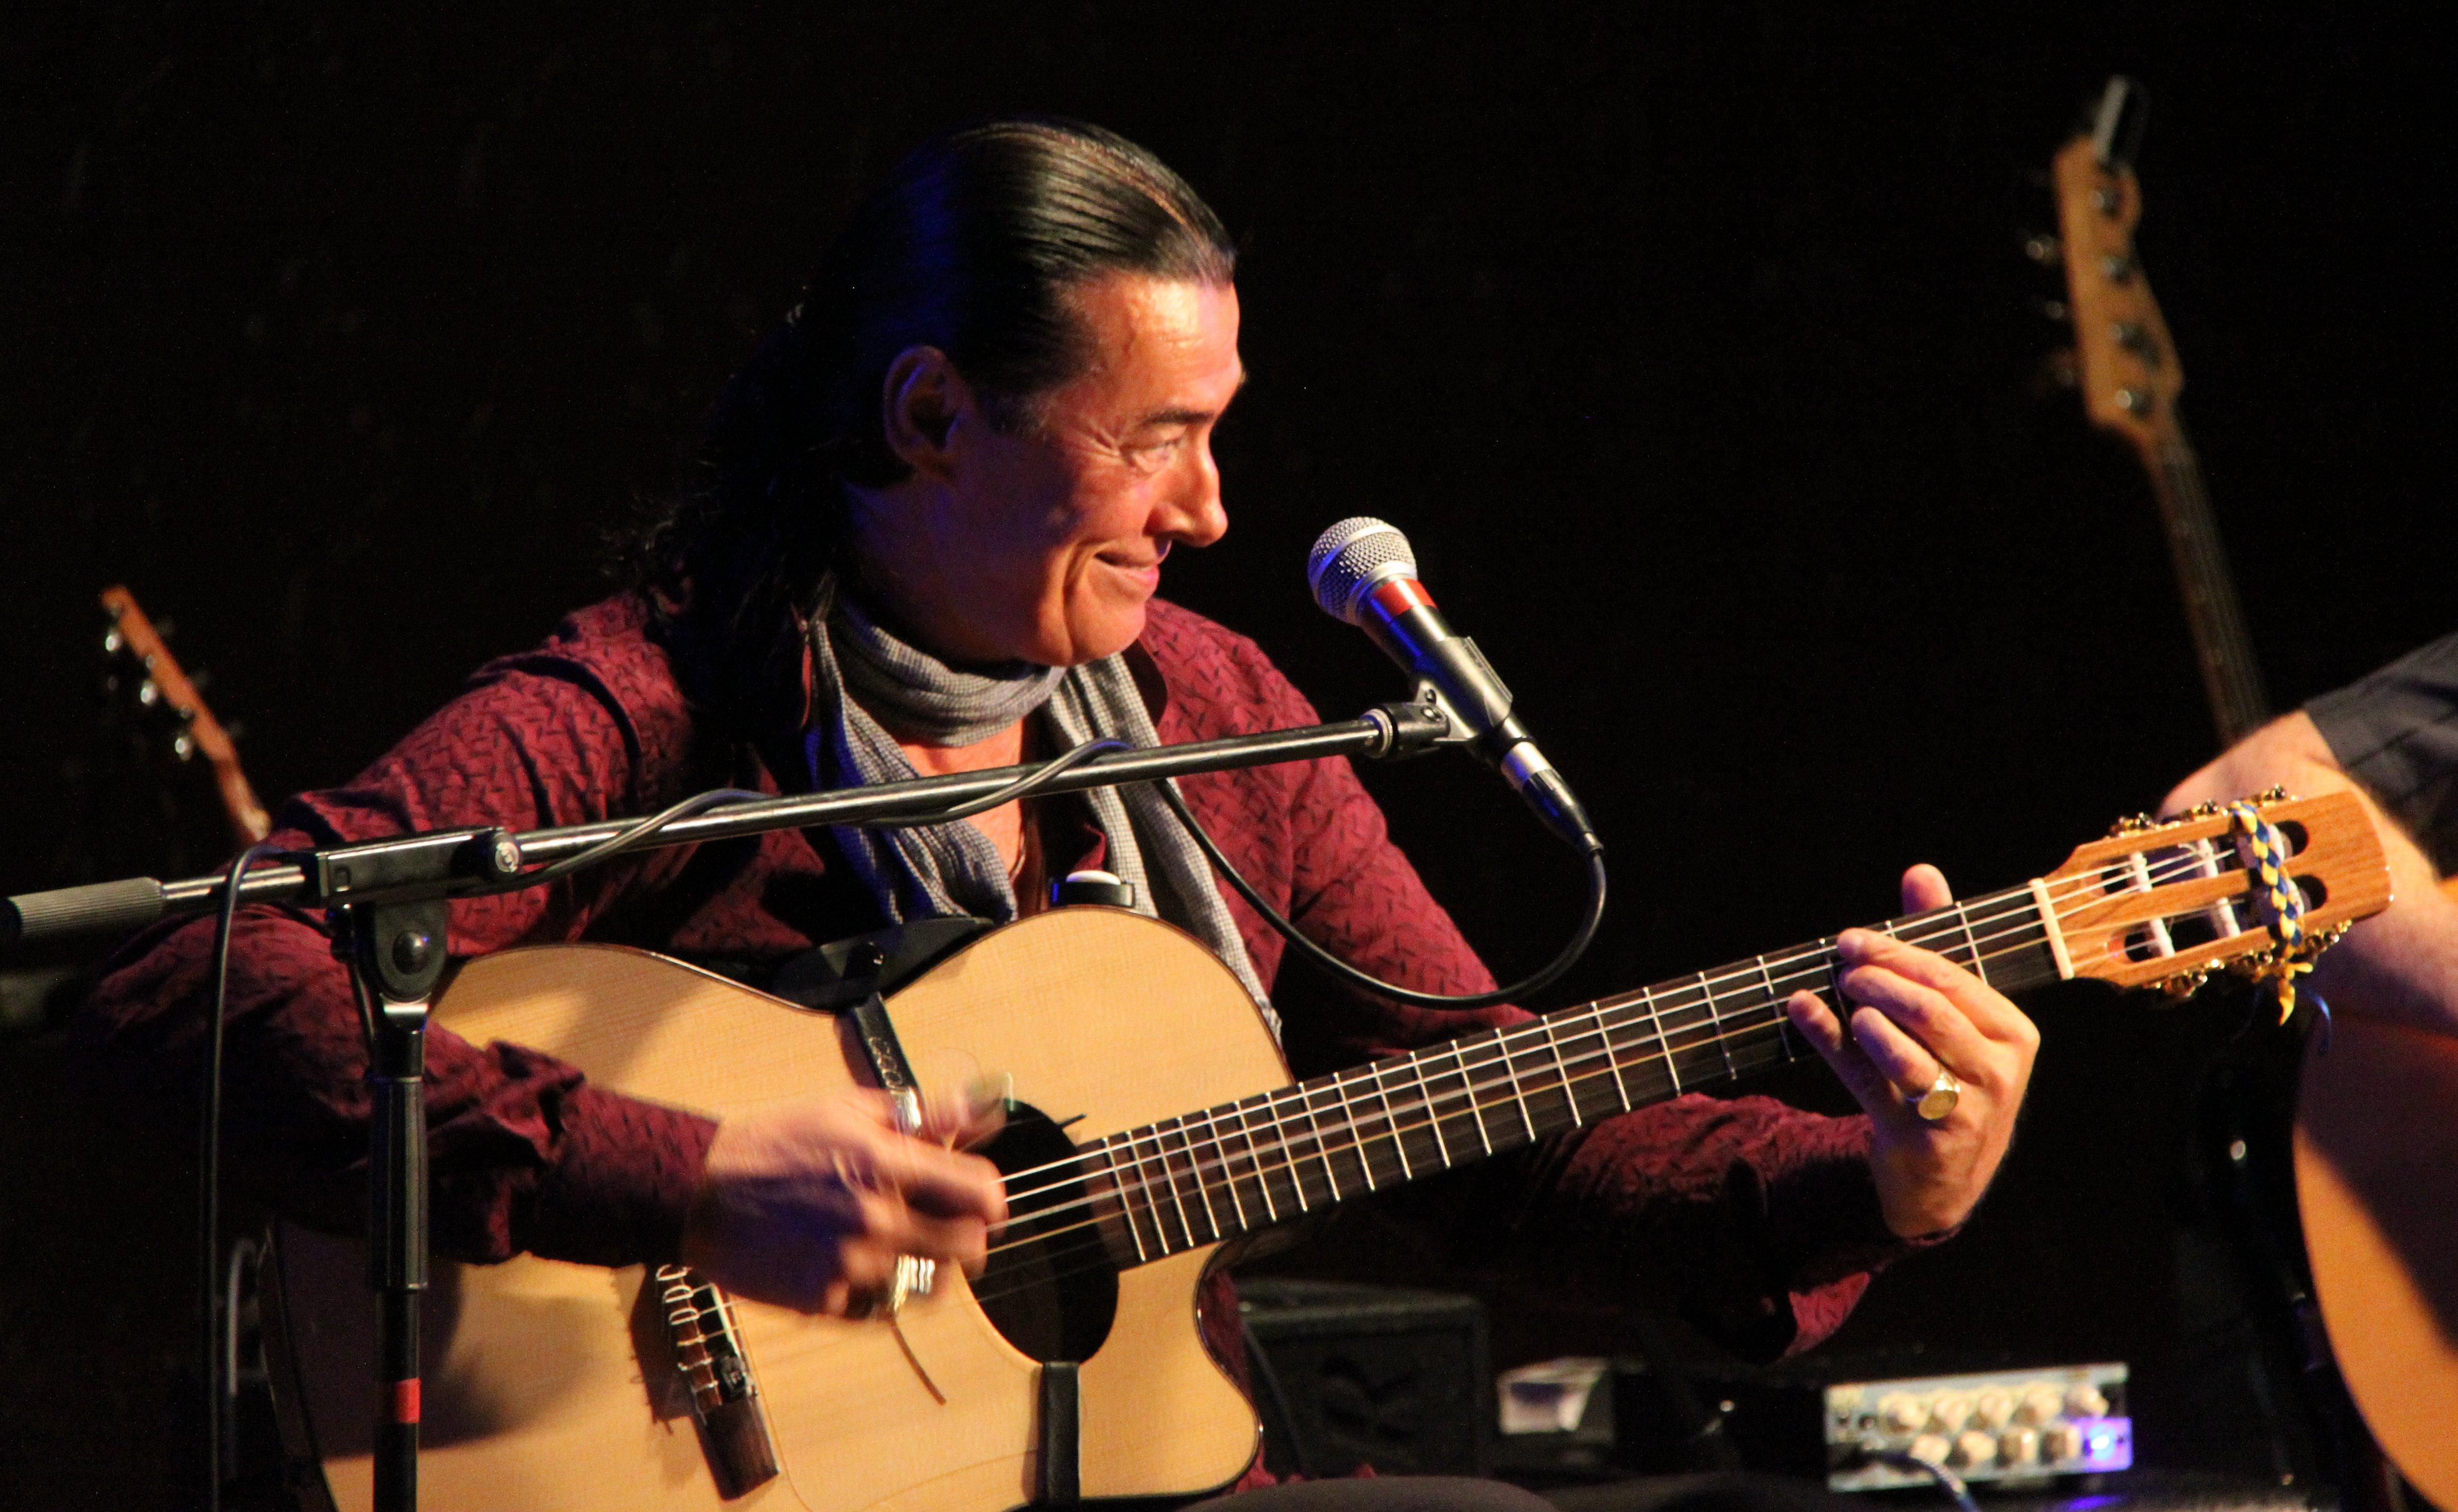 File:Lulo Reinhardt, German gypsy-latin jazz musician on